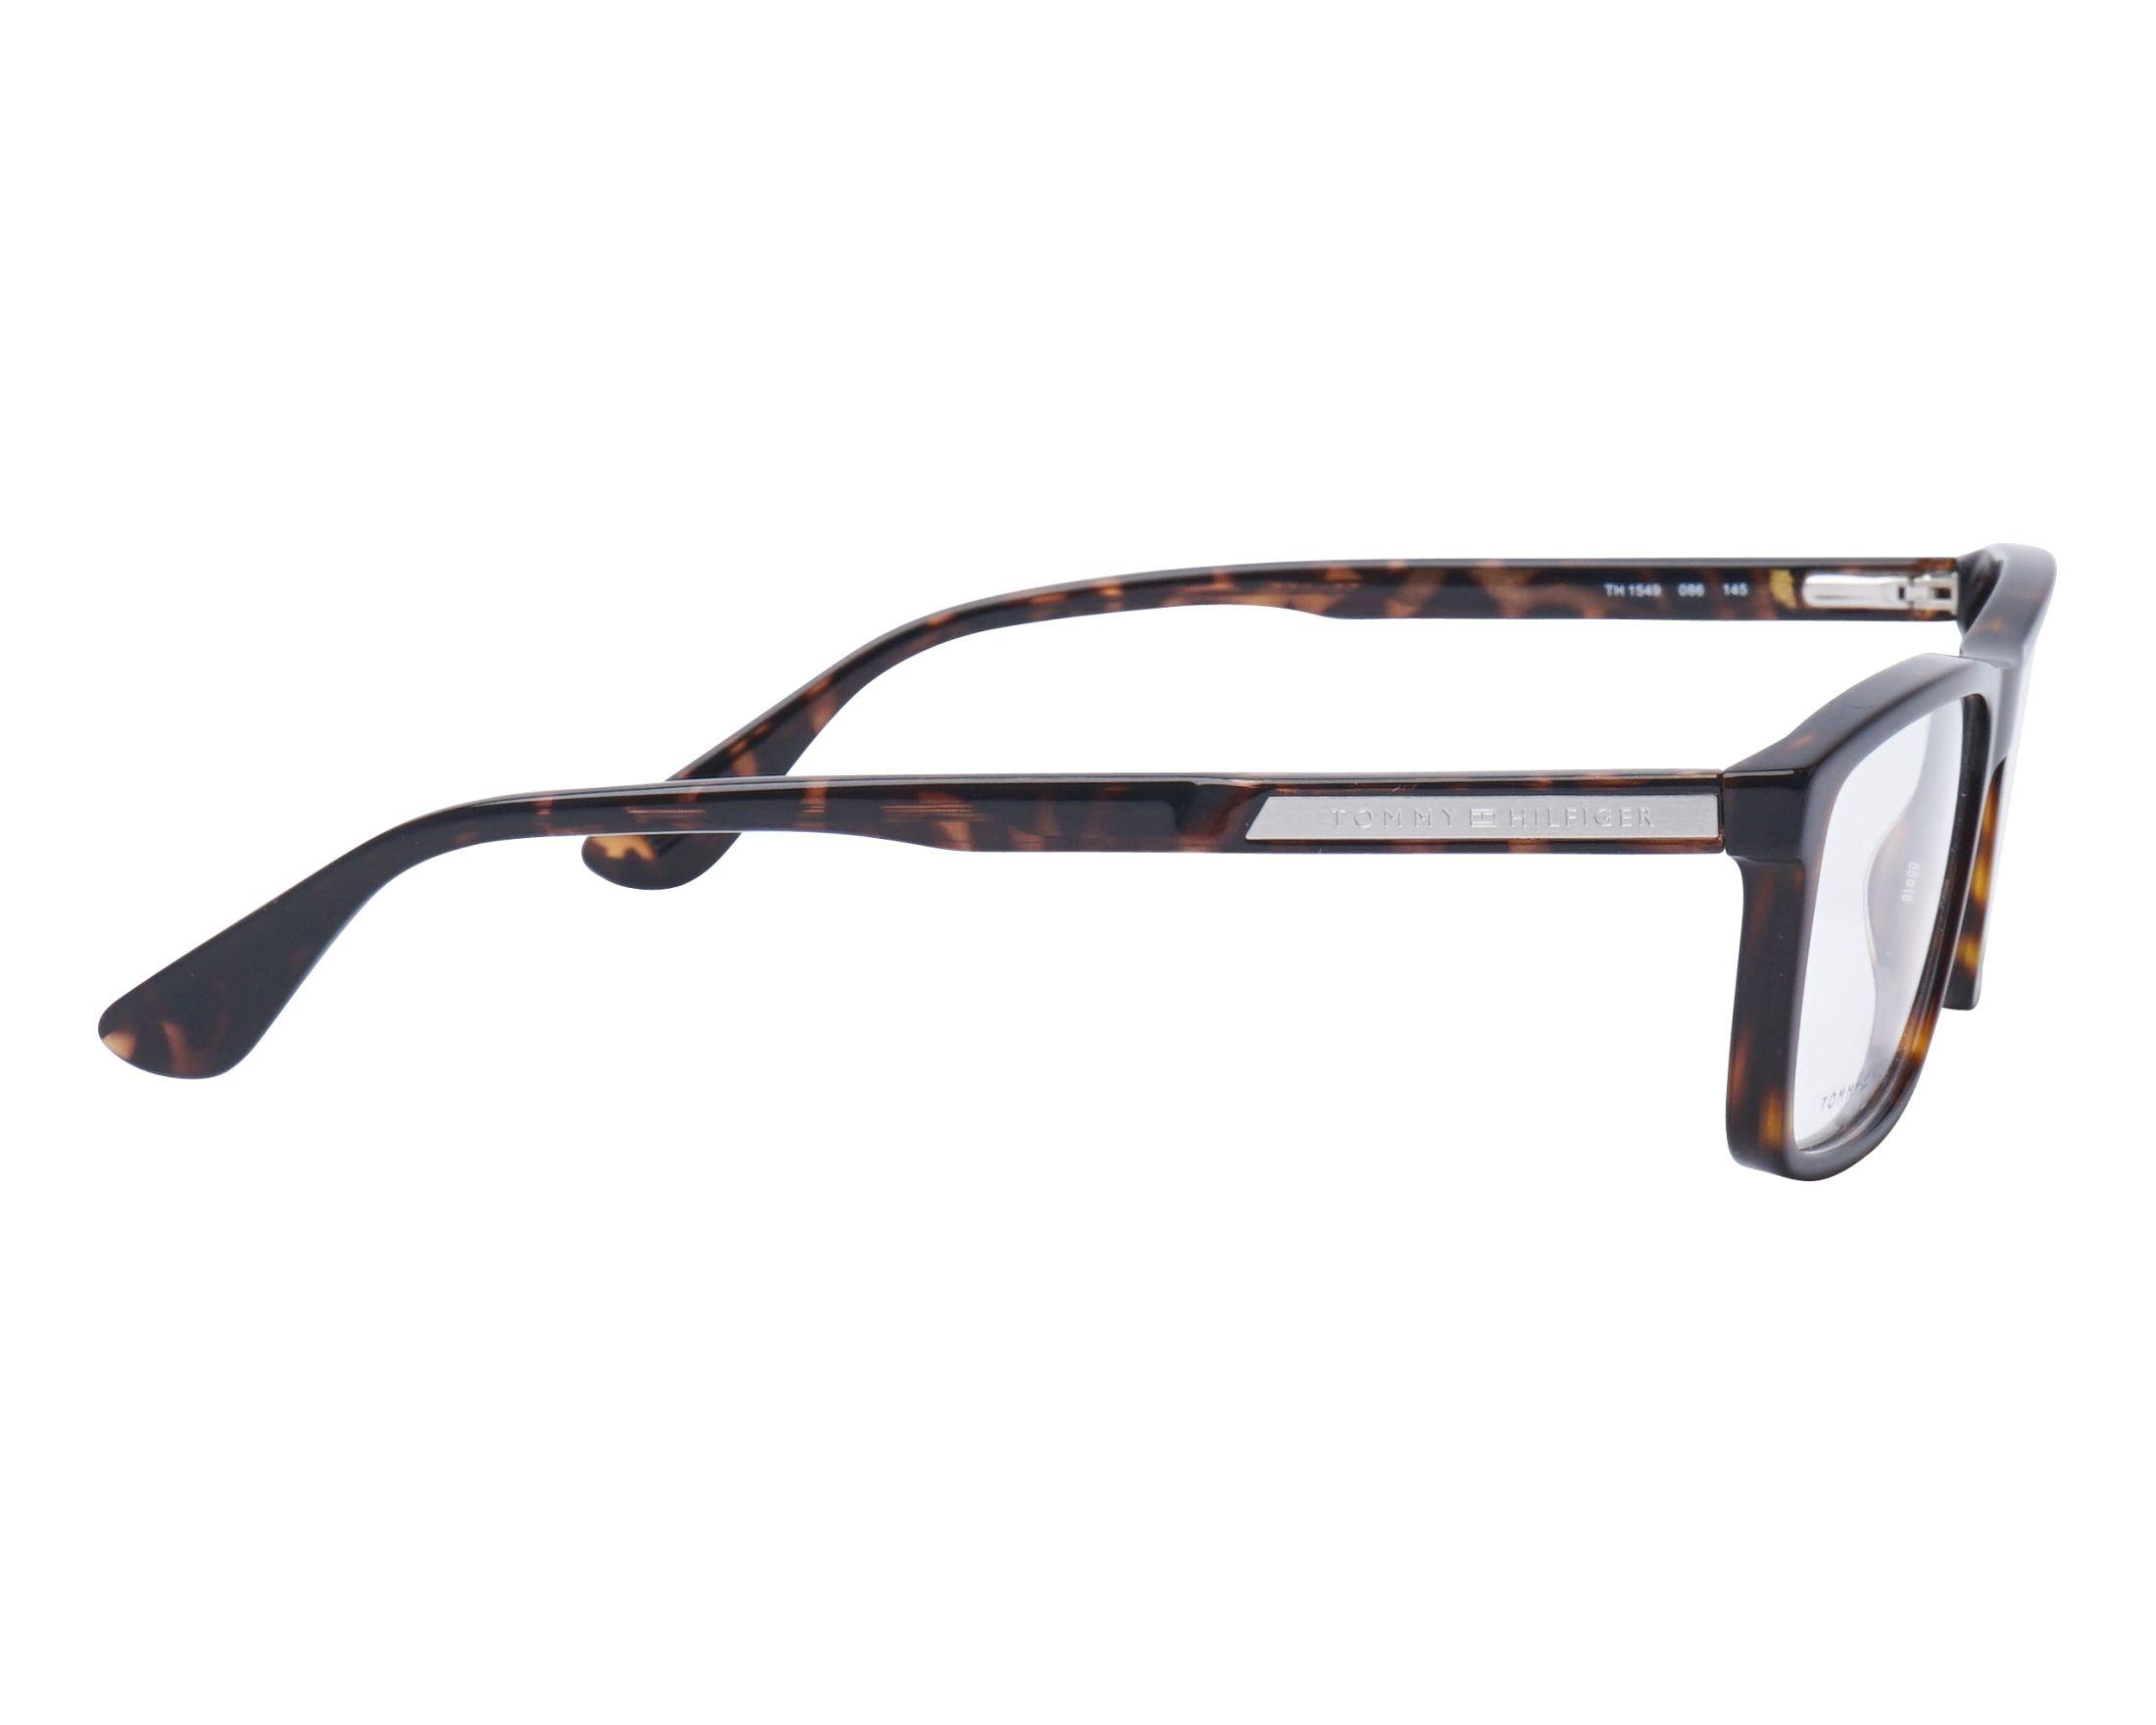 b62950a8b0404 Gafas Graduadas Tommy Hilfiger TH-1549 086 55-16 Havana vista lateral